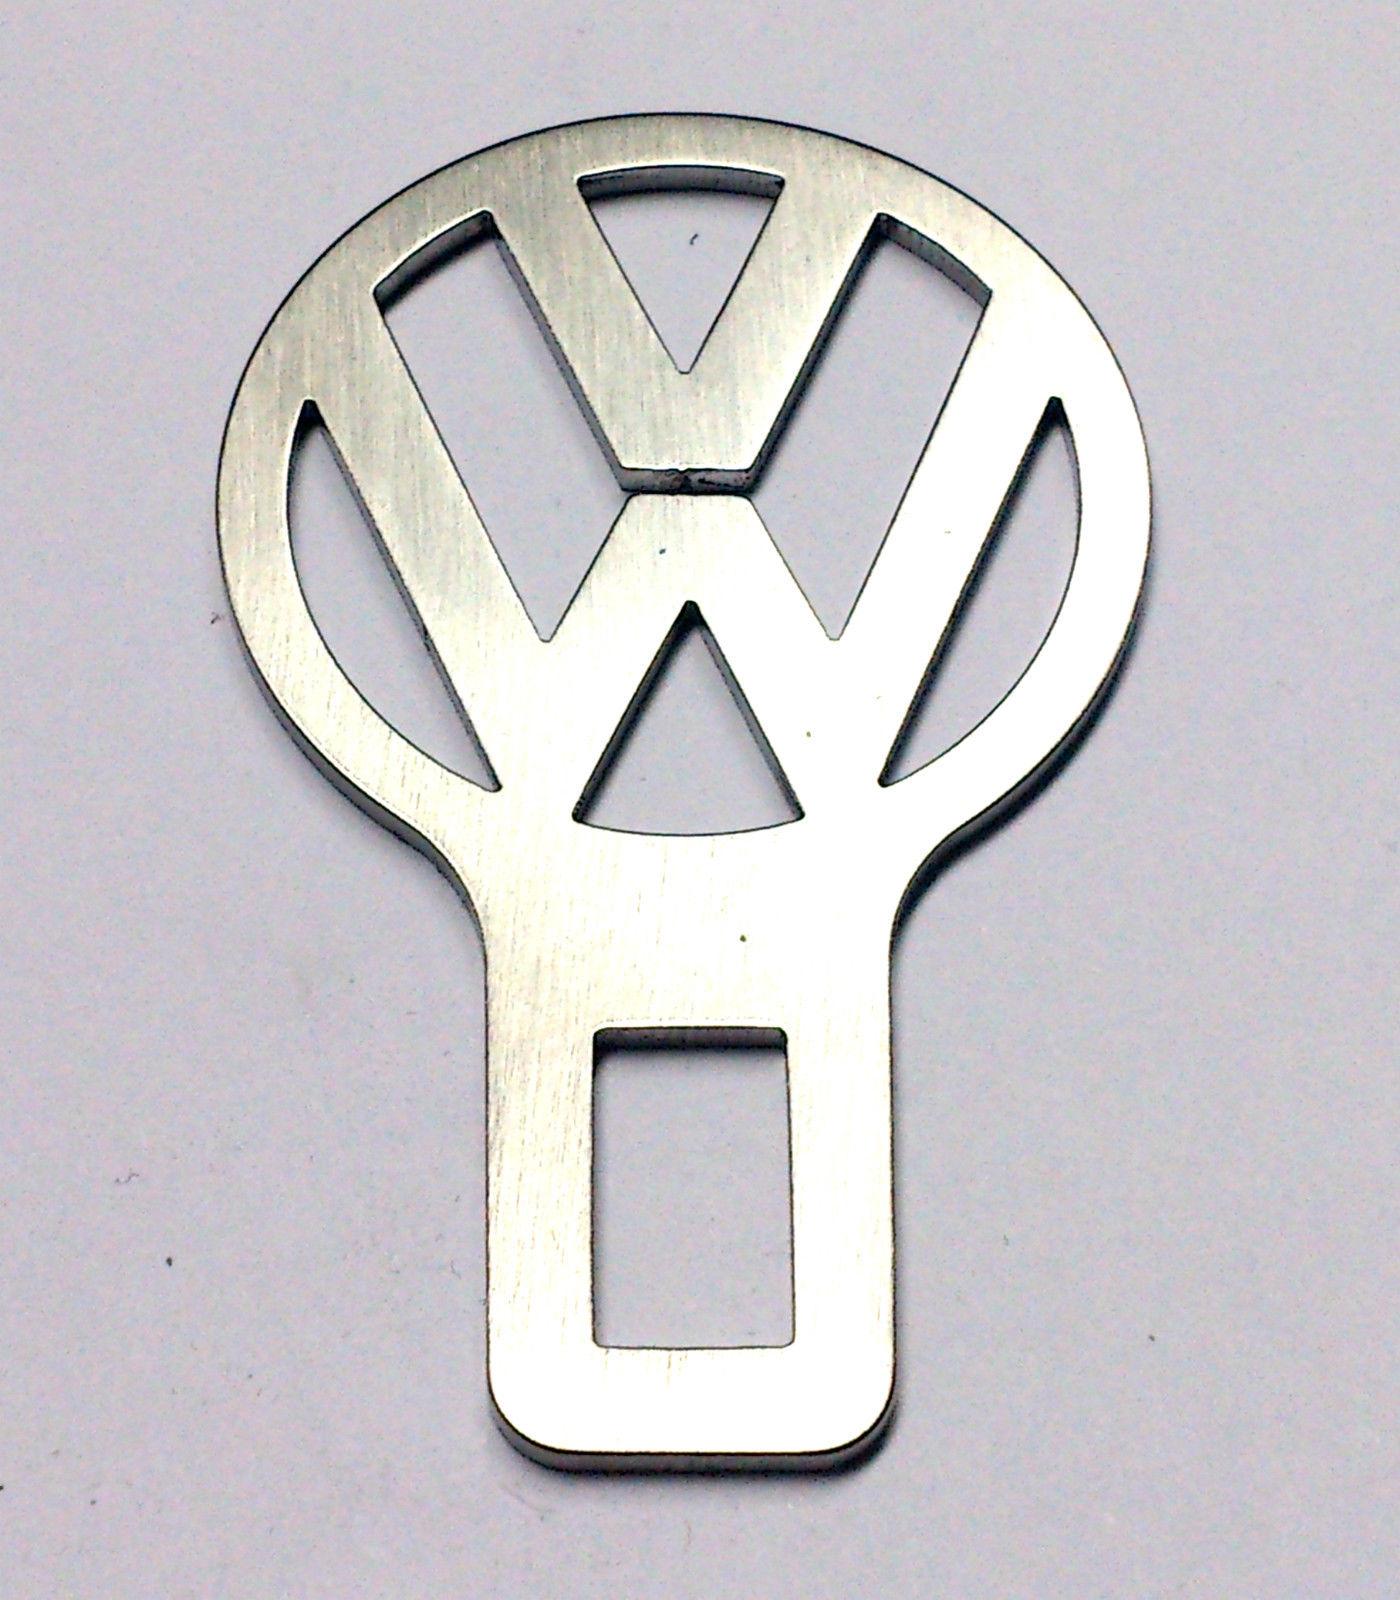 BIP STOP Cinture di Sicurezza Volkswagen in ACCIAIO INOX